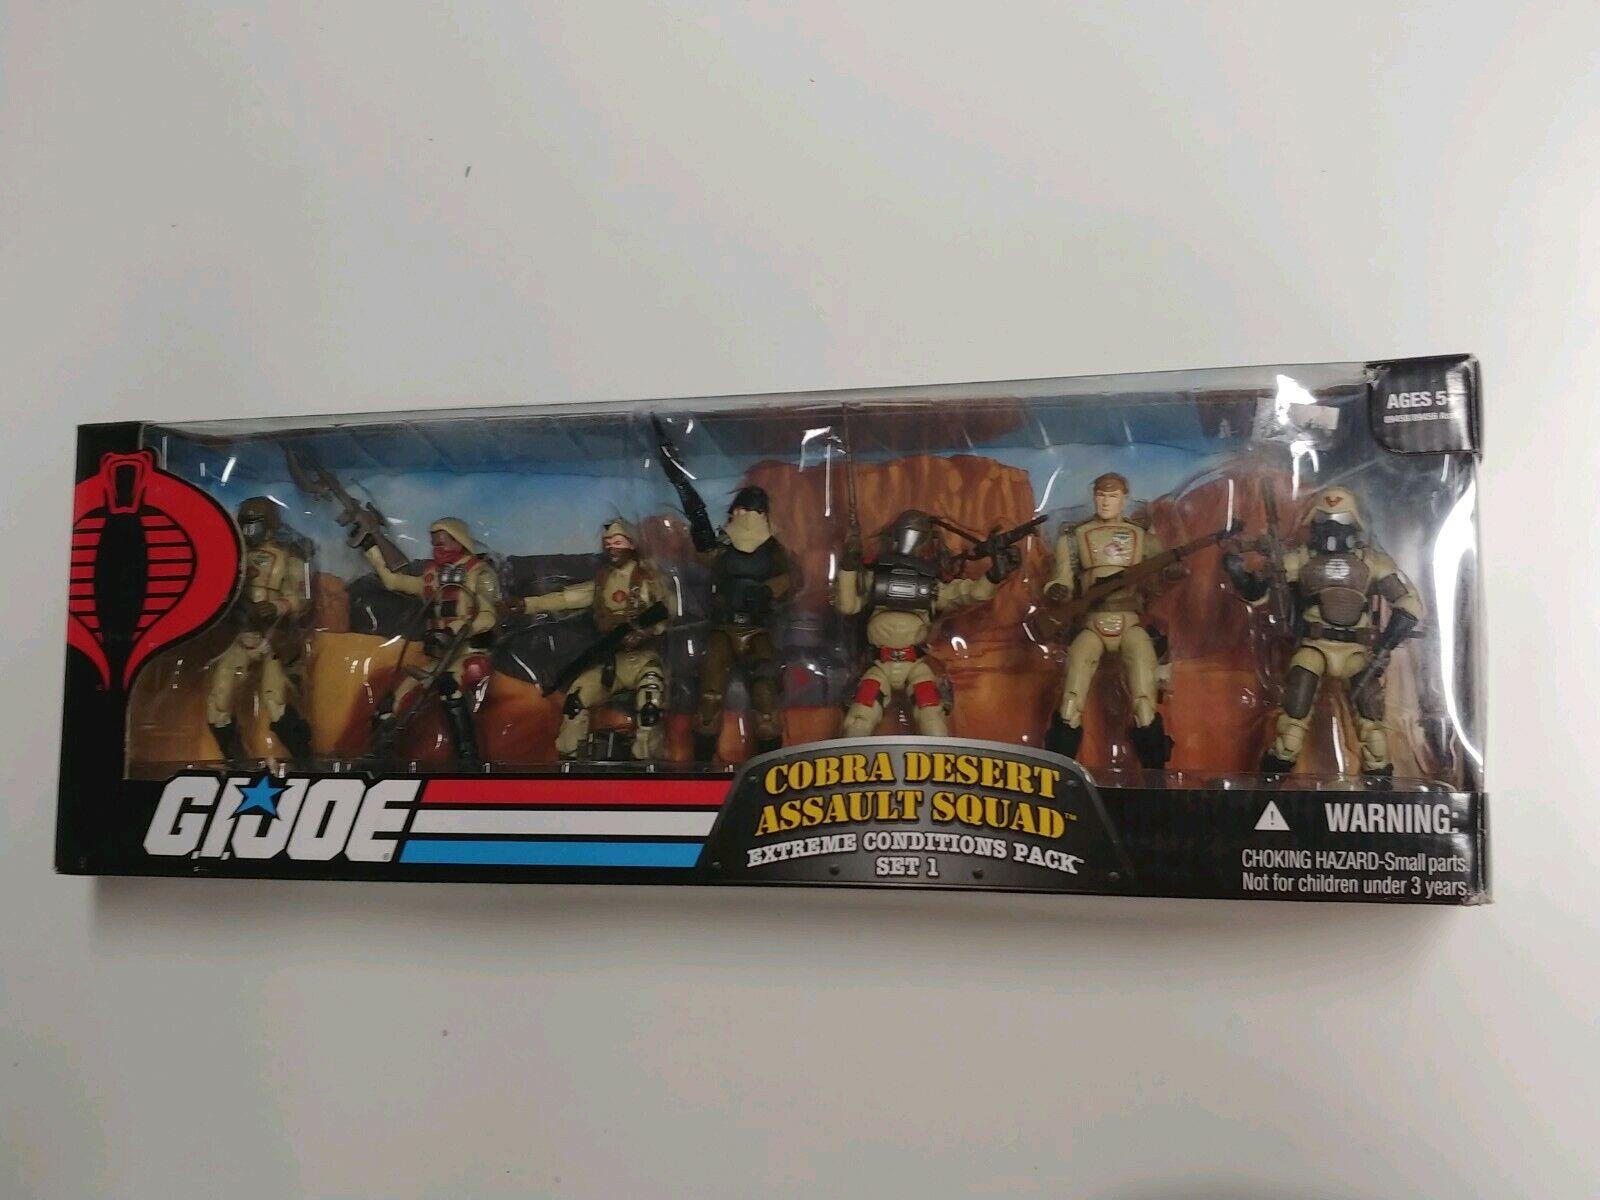 G.I. Joe COBRA DESERT Assault Squad conditions extrêmes Set 1 25TH Anniversaire